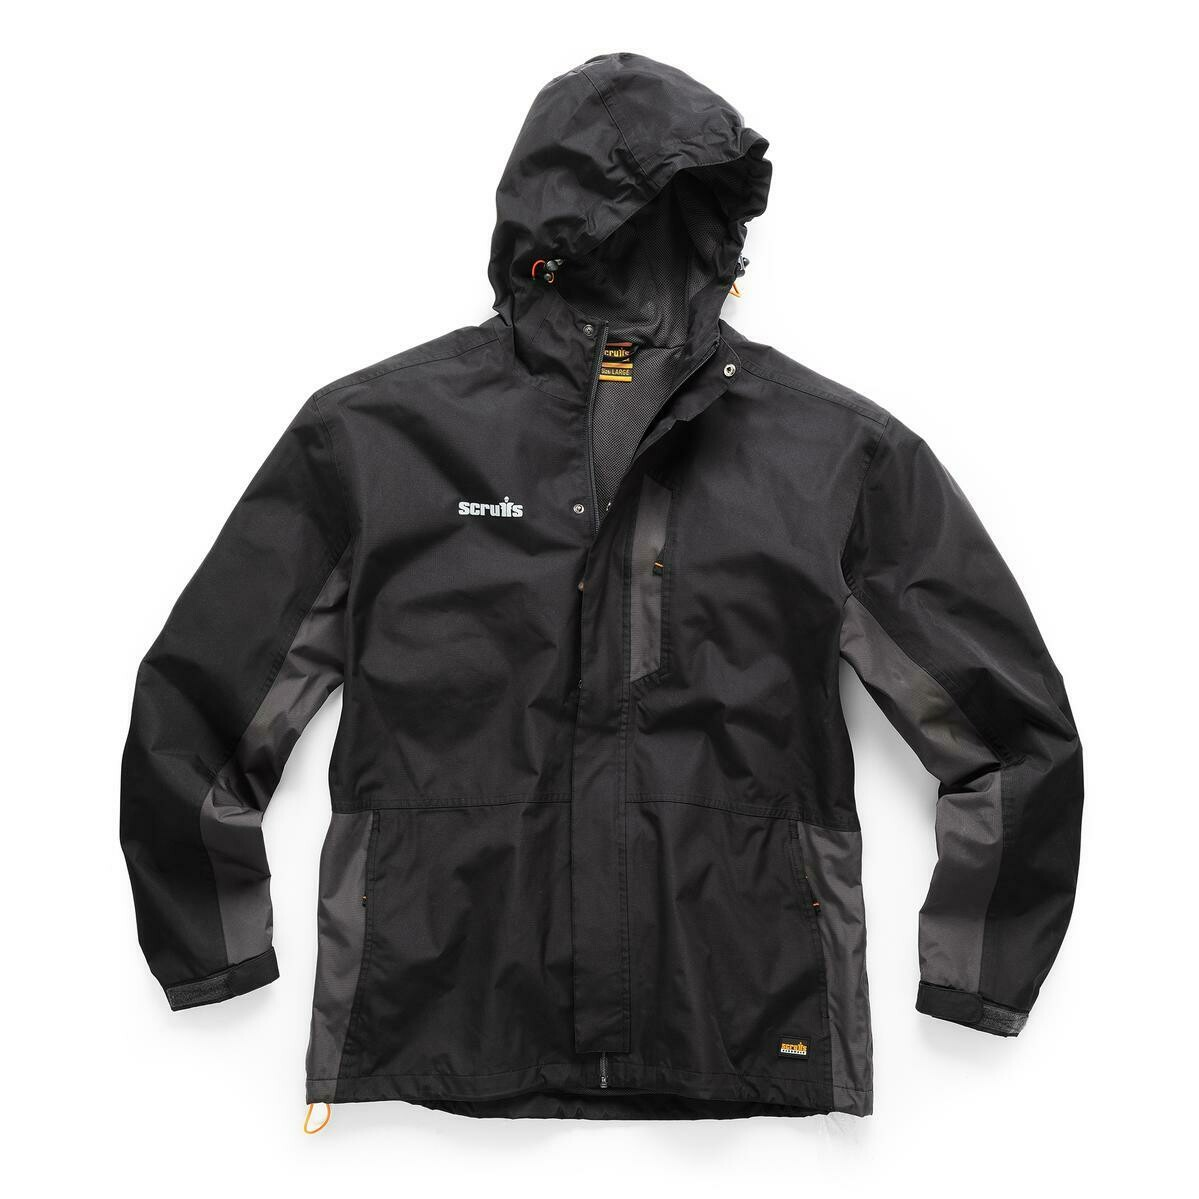 Scruffs Worker Jacket - Black